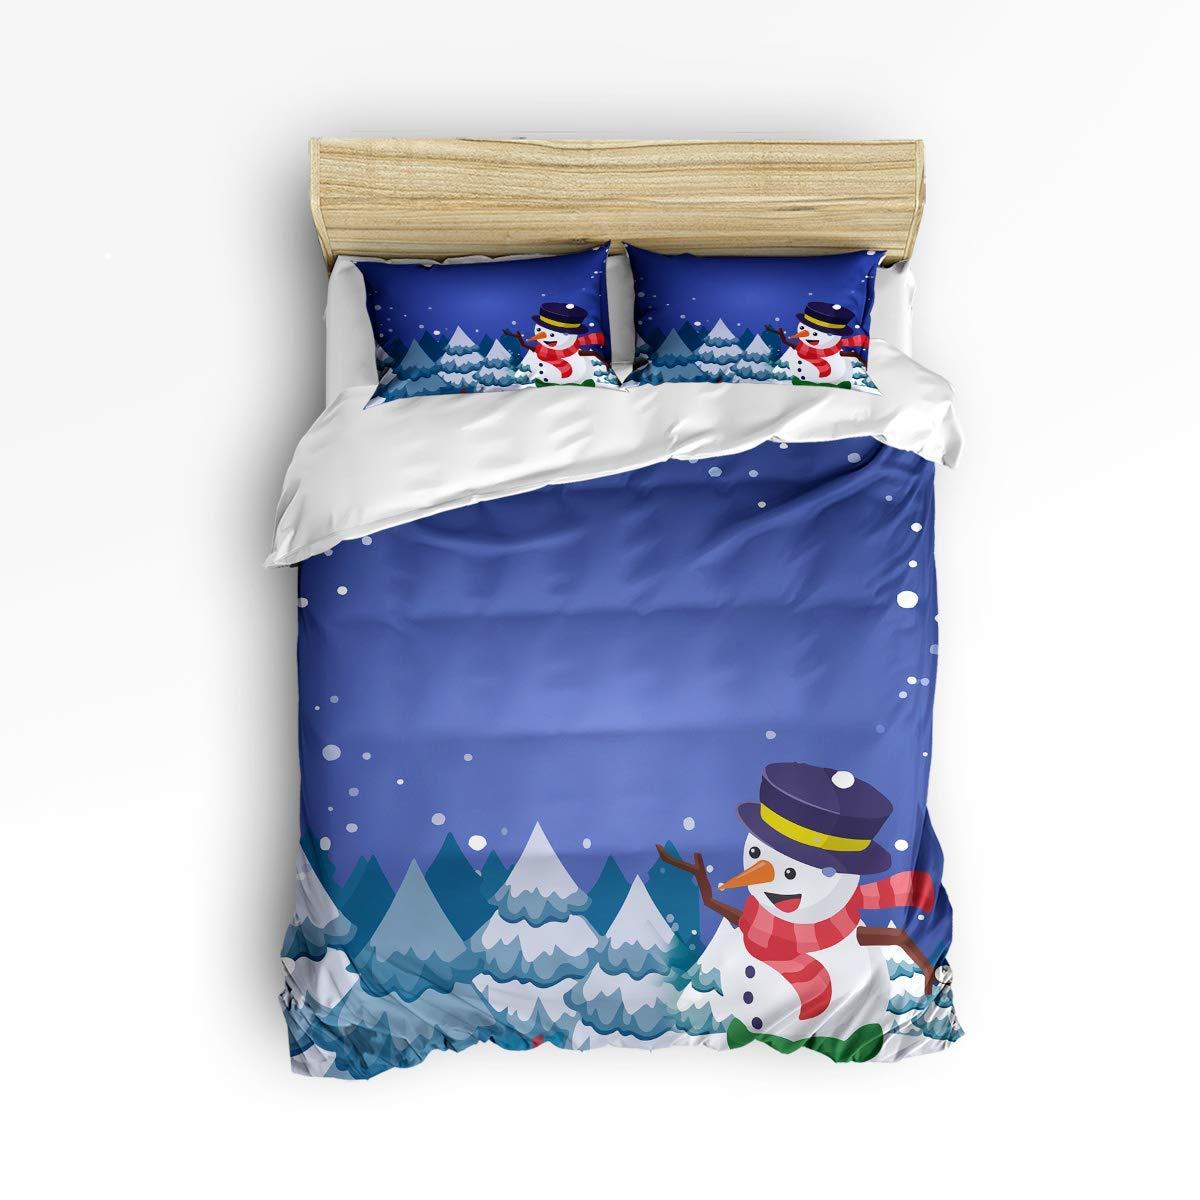 CVICV 寝具3点セット クリスマス 雪だるま フォーマル 帽子 雪の中に立つ 自然の夜 3ピース CVICVセット ベッドスプレッド デイベッド 子供/子供/ティーン/大人 Twin Size zly3pcsbeds-181022-SWTQ00409SJSAAZN B07QGNB52J Hatsnowmanazn7472 Twin Size